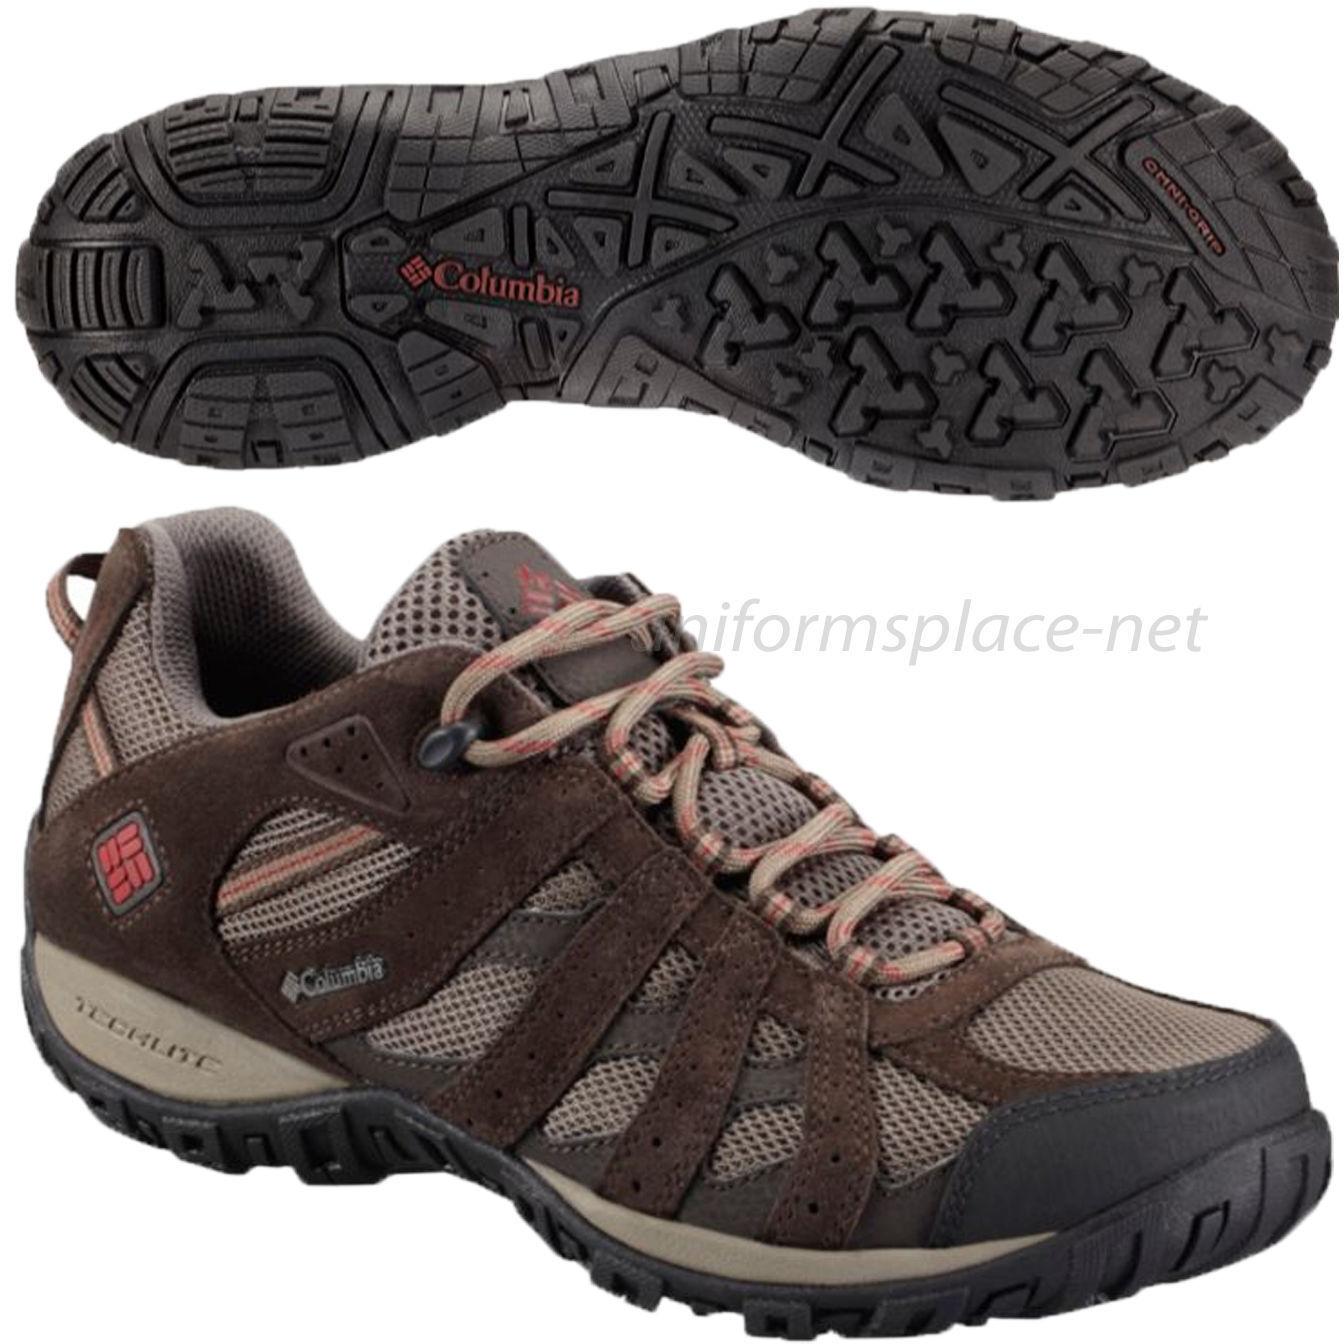 Columbia Shoes Mens Redmond Waterproof Mud Suede Leather Hiker Boots BM3938